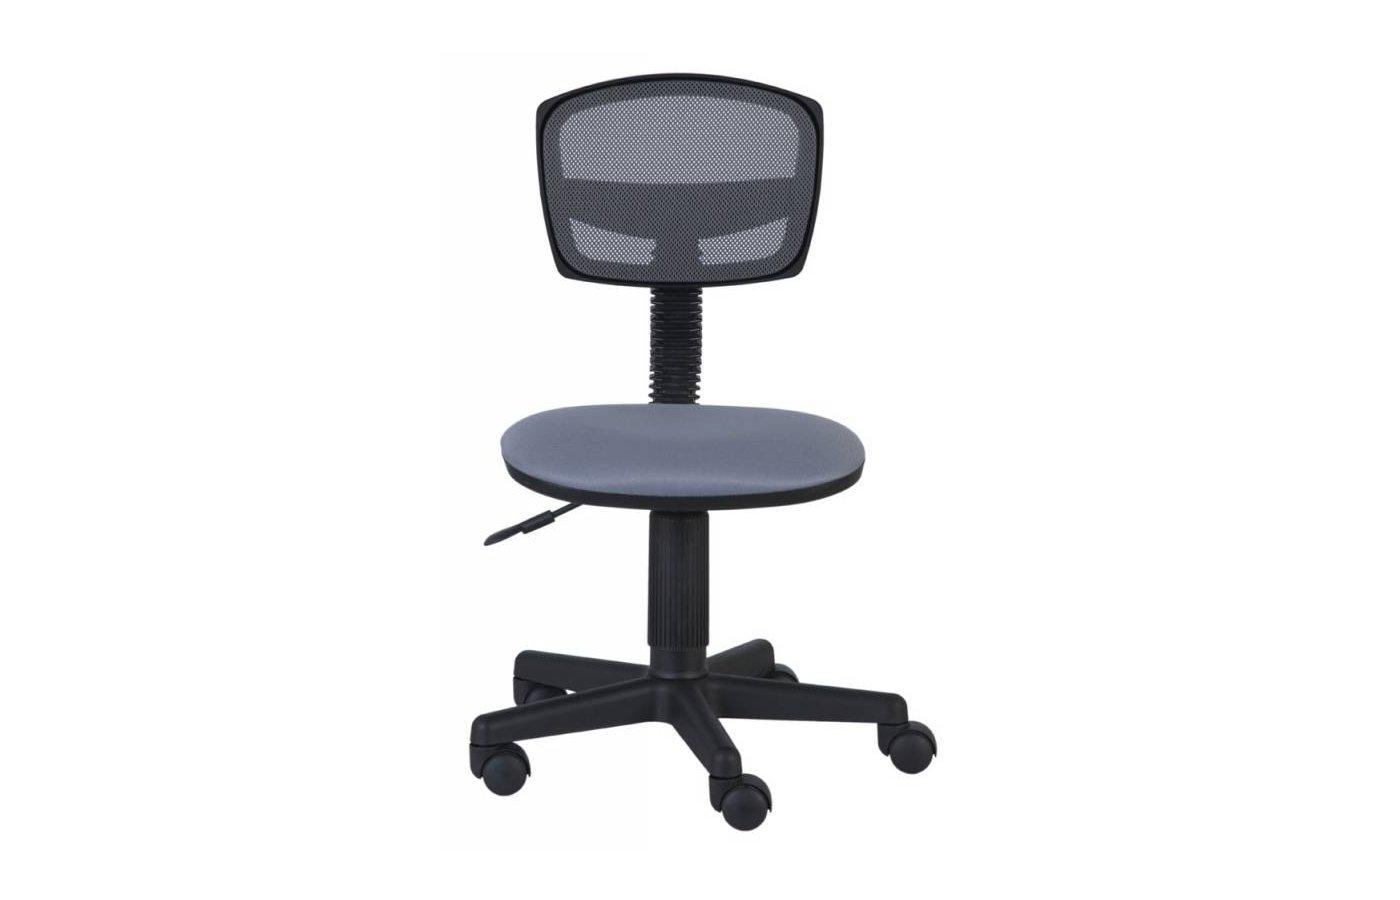 Бюрократ CH-299/G/15-48 спинка сетка серый сиденье серый 15-48